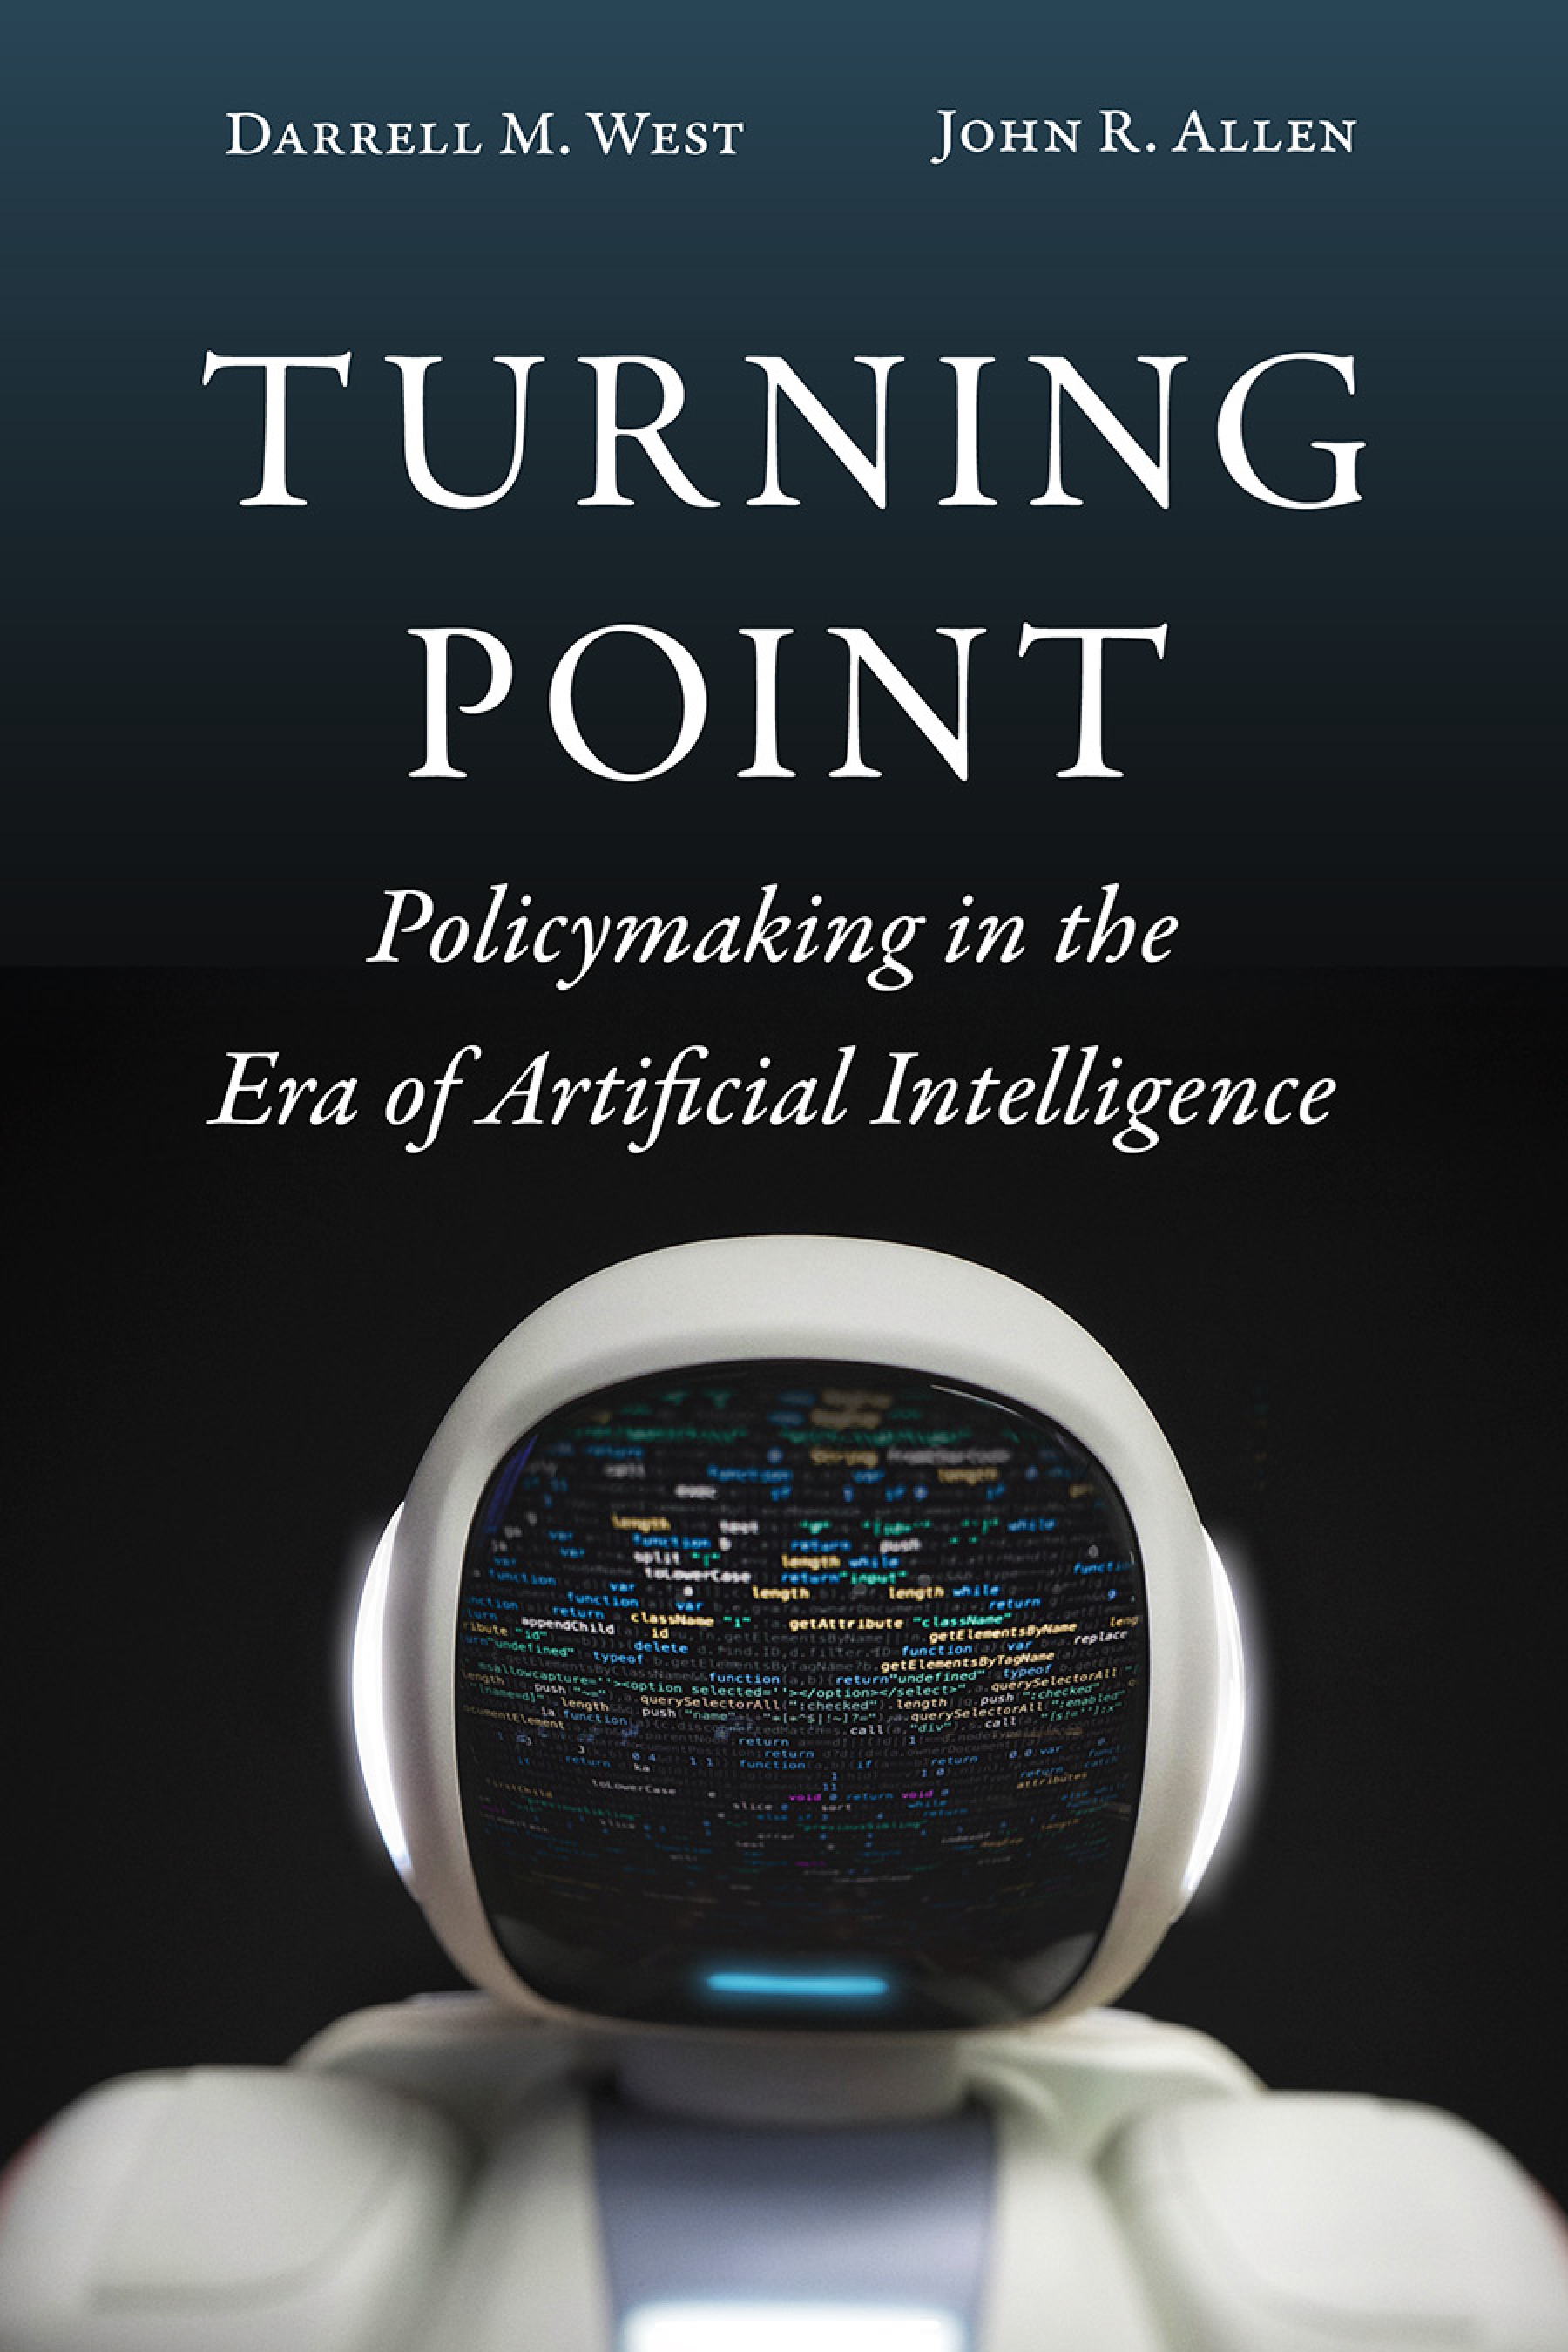 Cvr: Turning Point